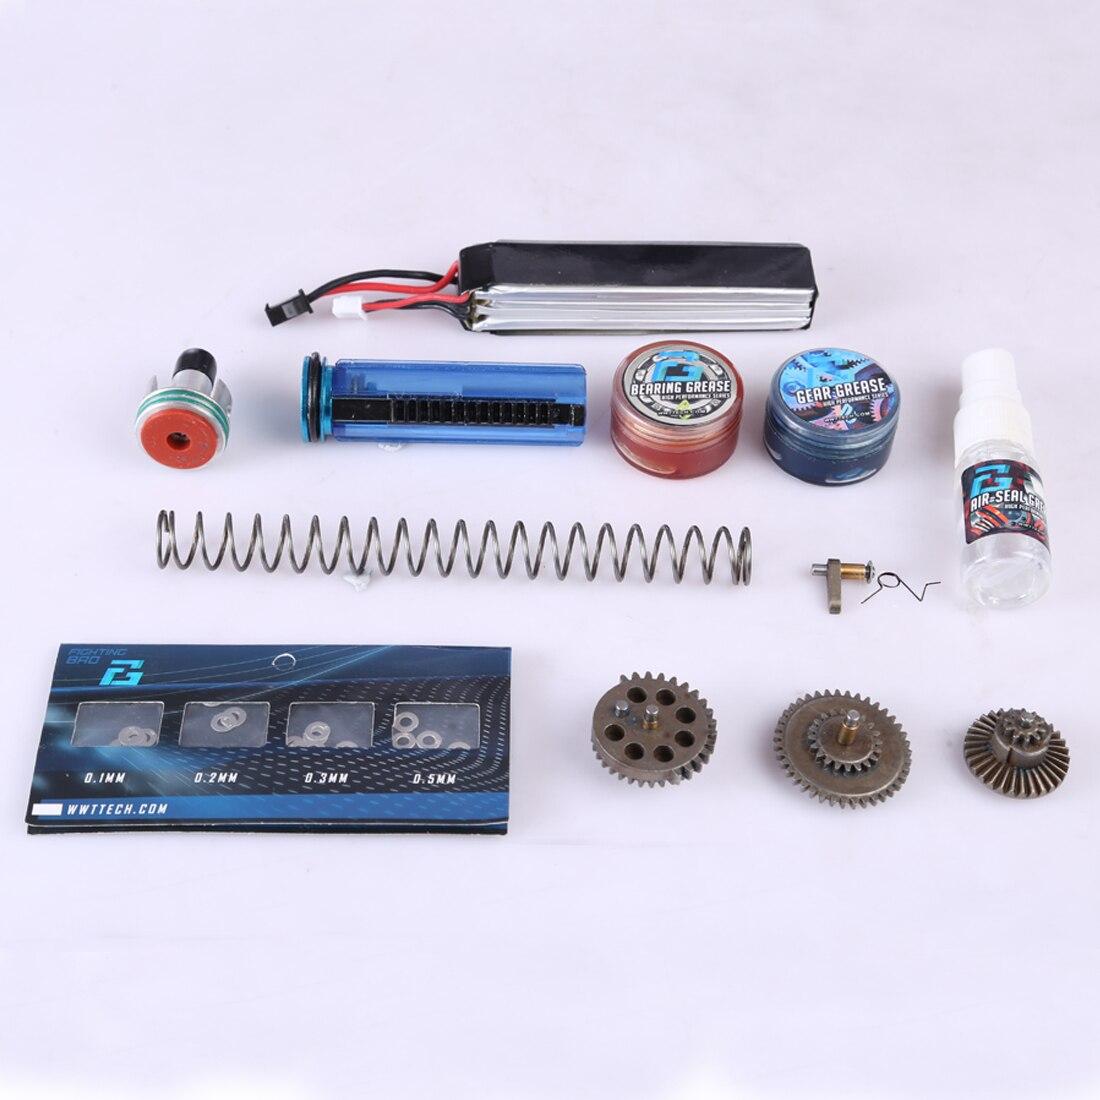 DIY Jinming Gear Box Basic Modification Kit For Jinming Gen 8 M4 And Gen 2 Scar